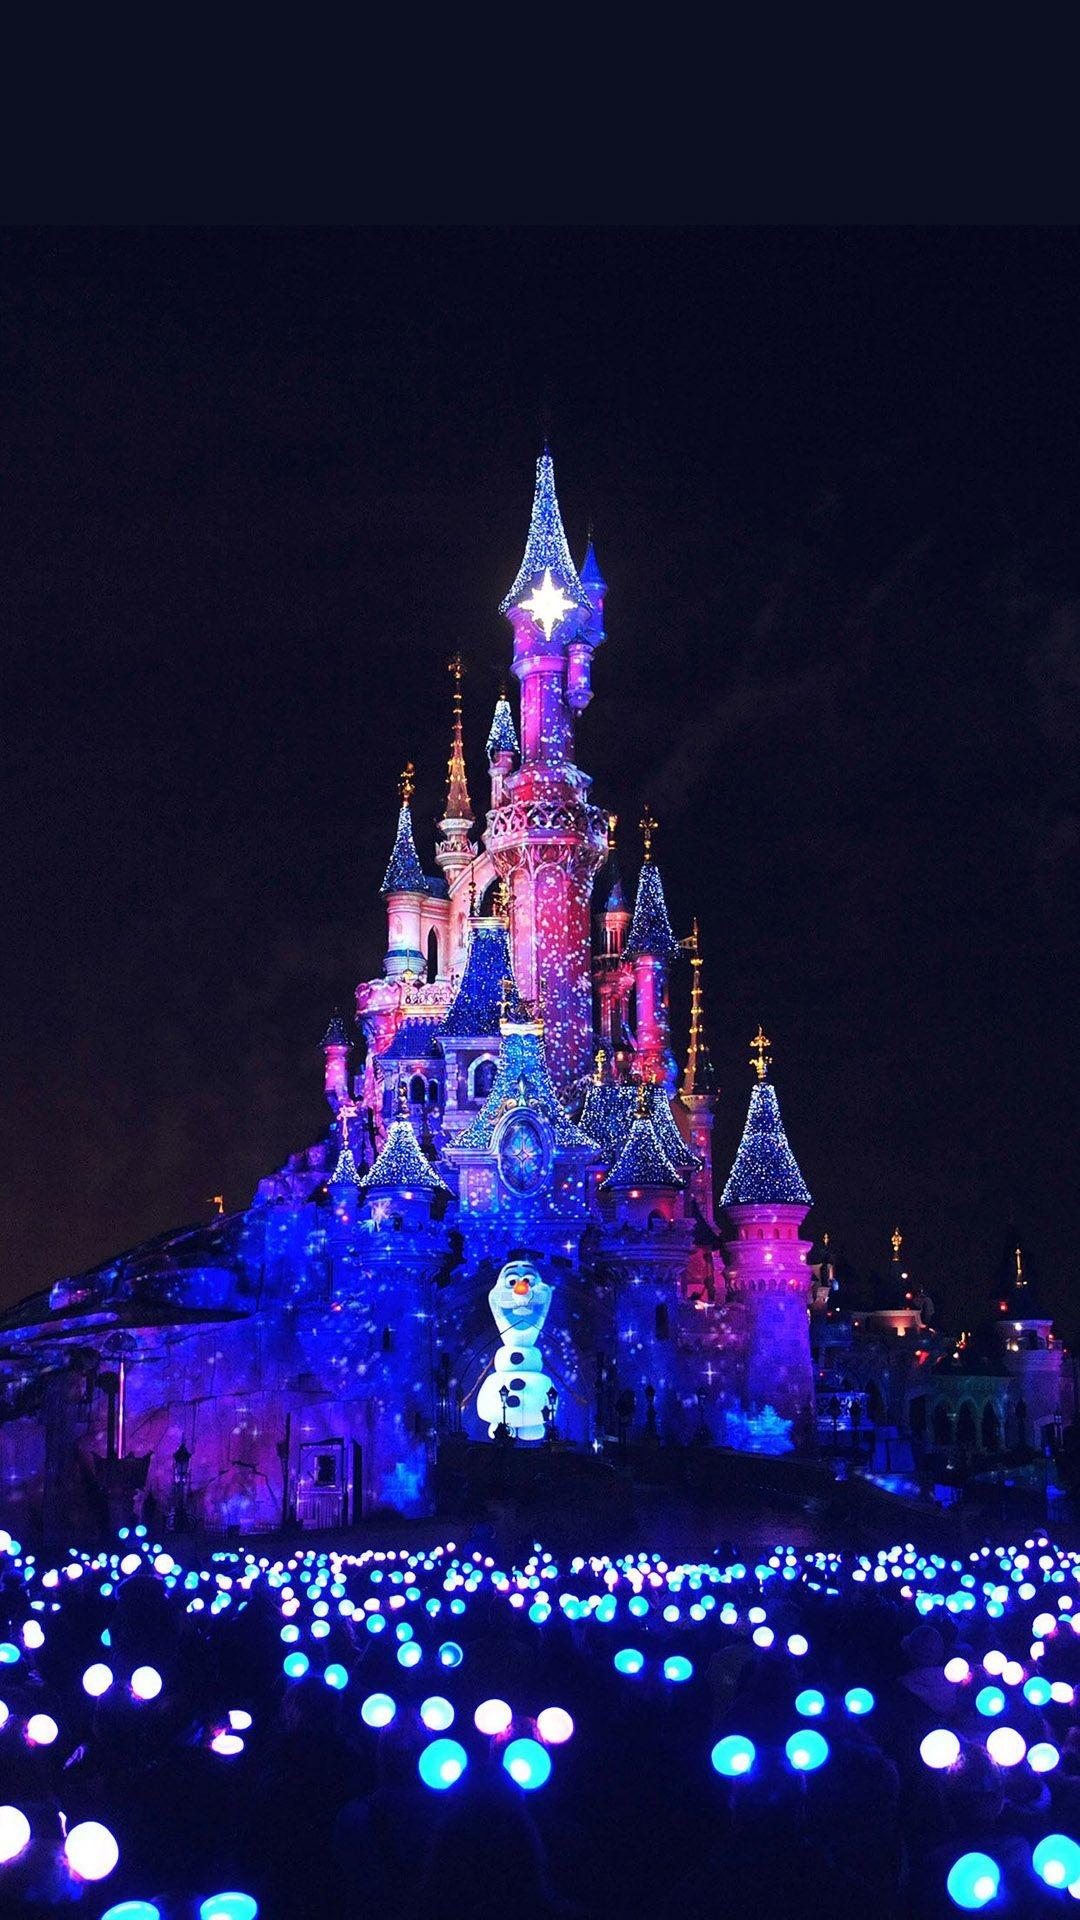 Light Up Of Cinderella Castle Iphone Wallpaper